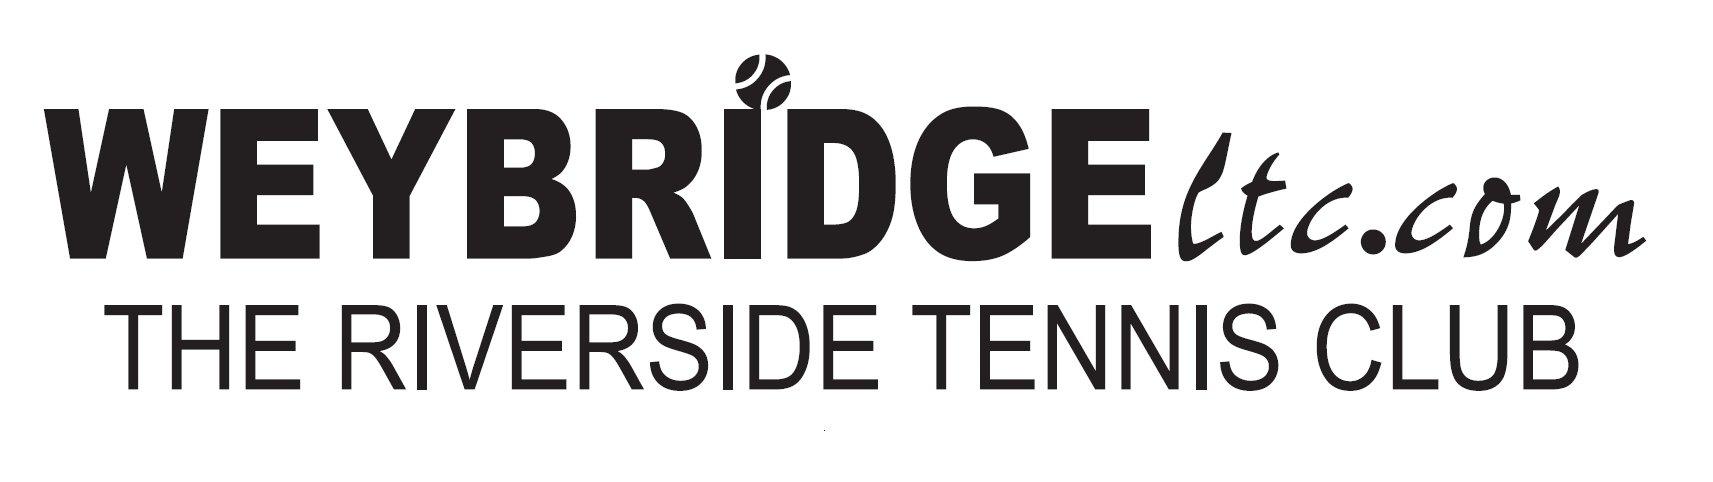 Weybridge LTC